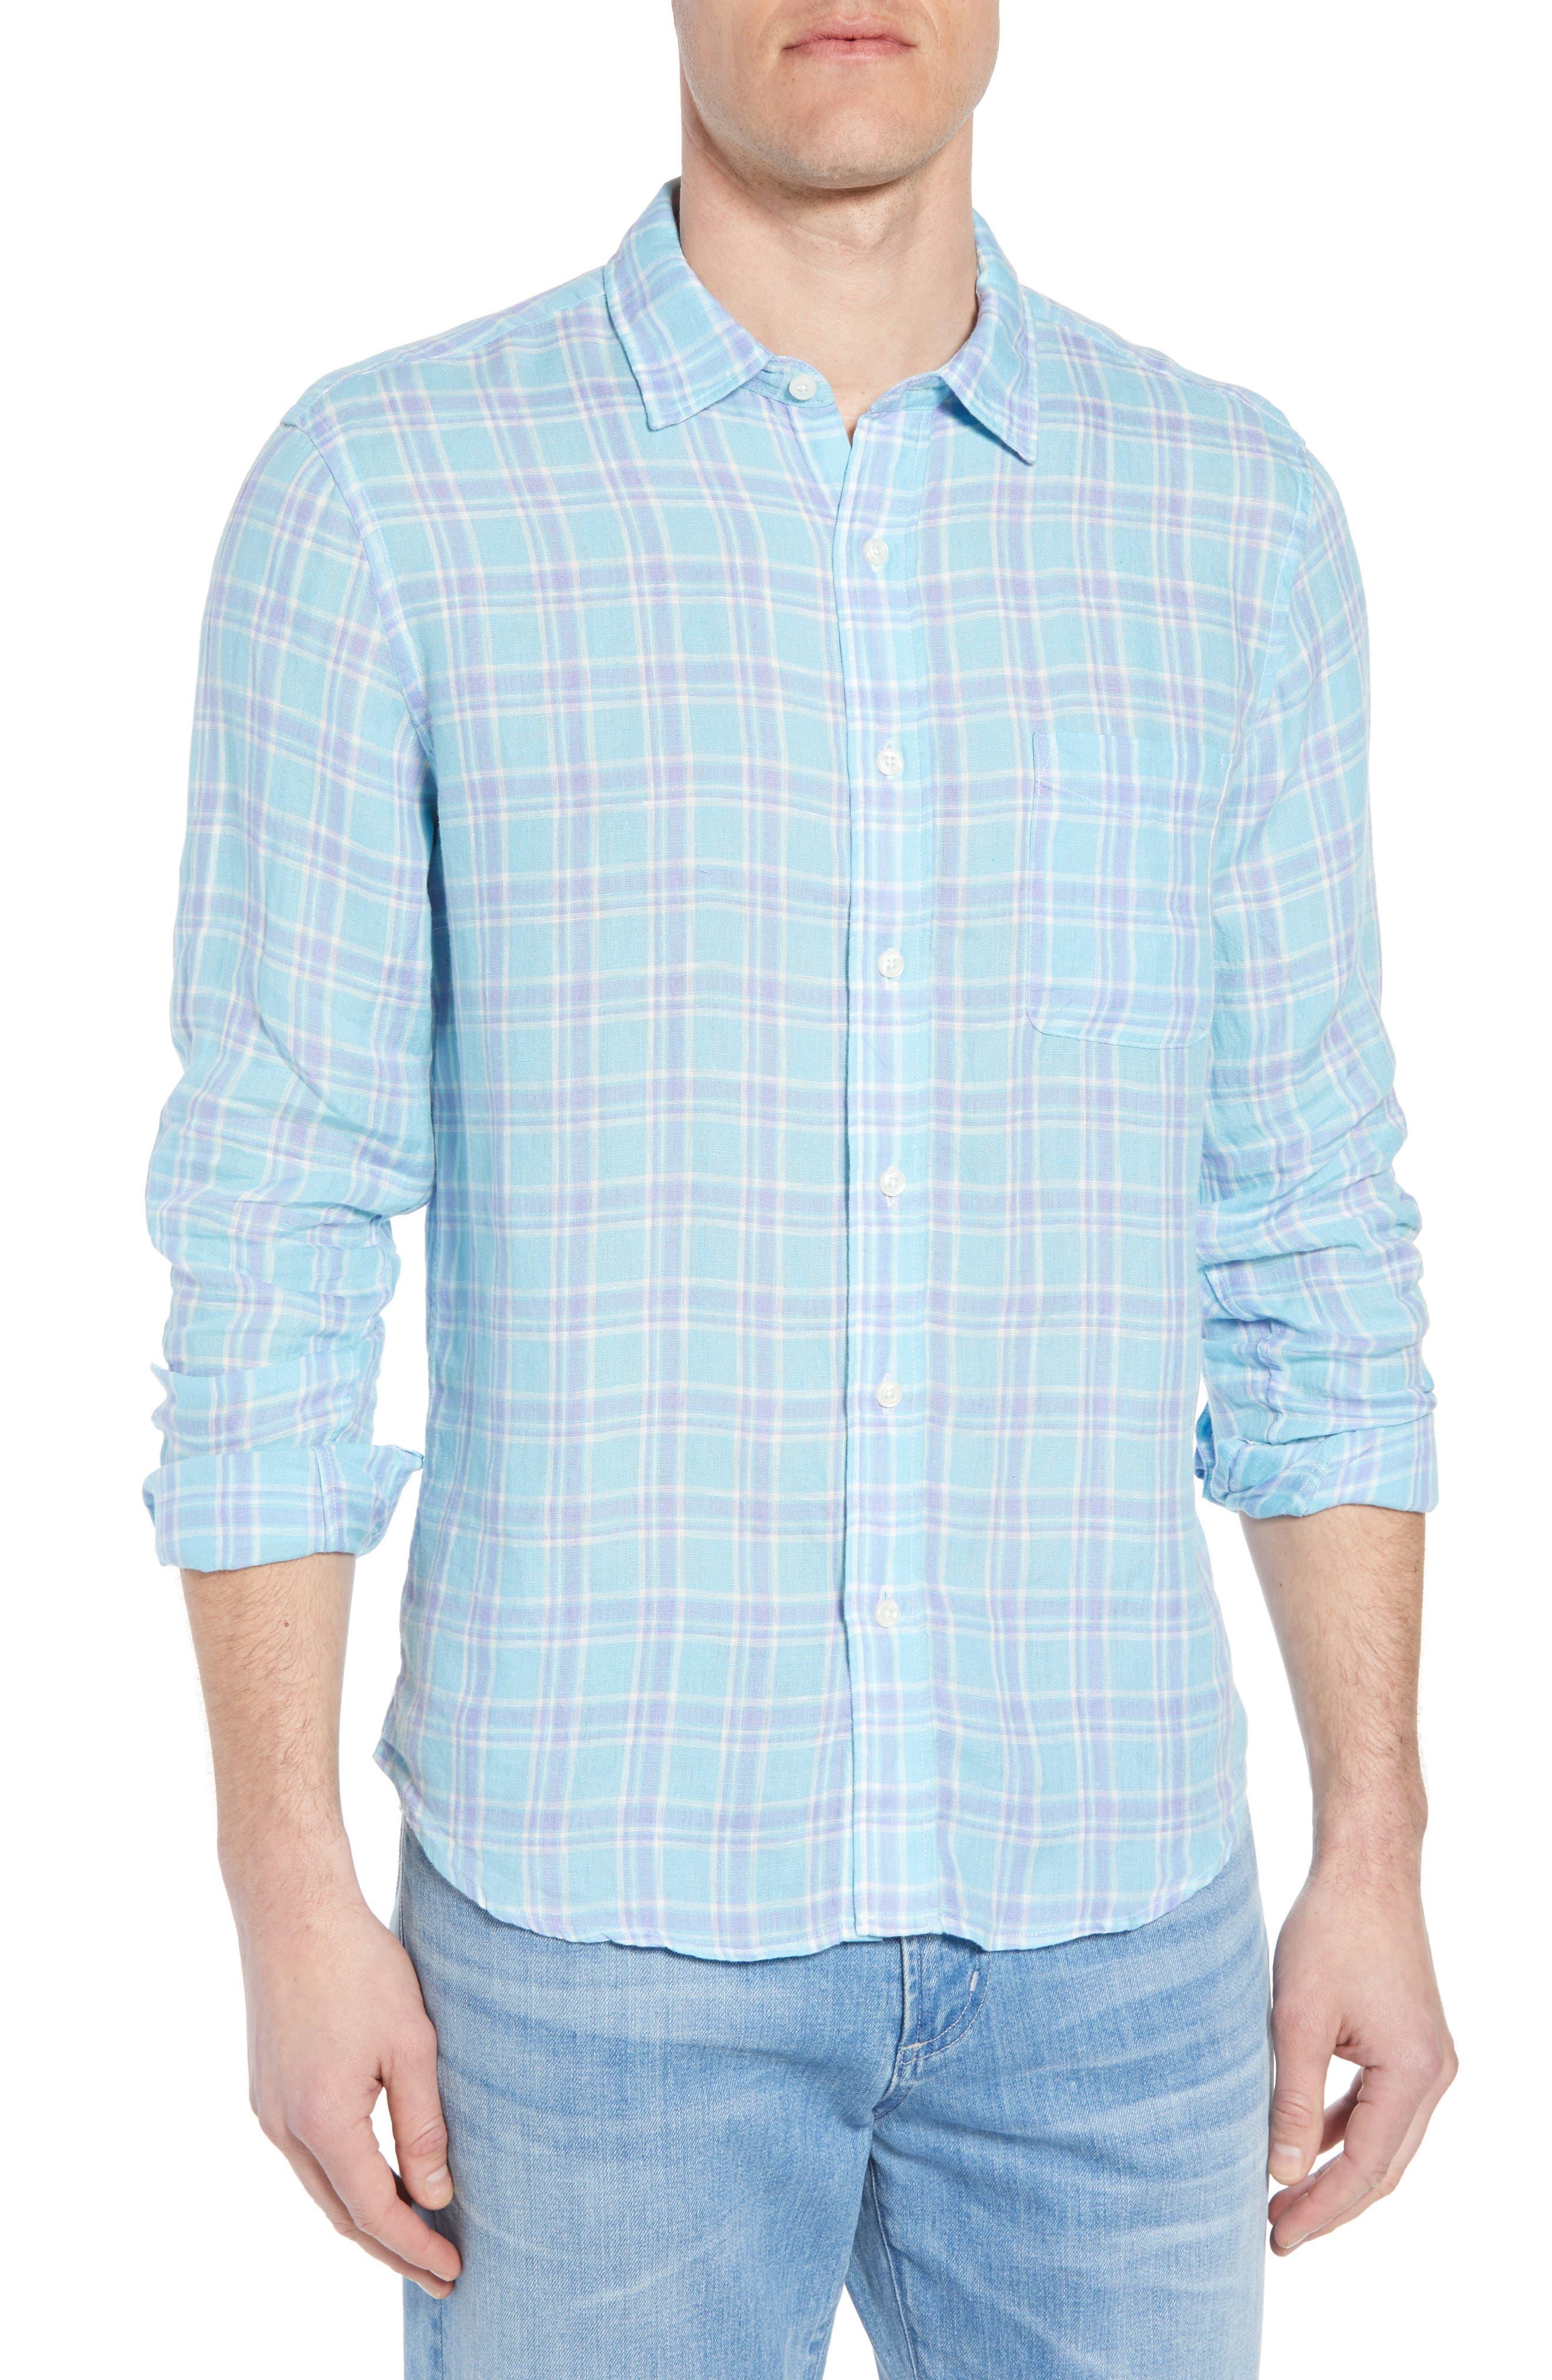 Ventura Plaid Linen Sport Shirt,                             Main thumbnail 1, color,                             Teal Purple Plaid